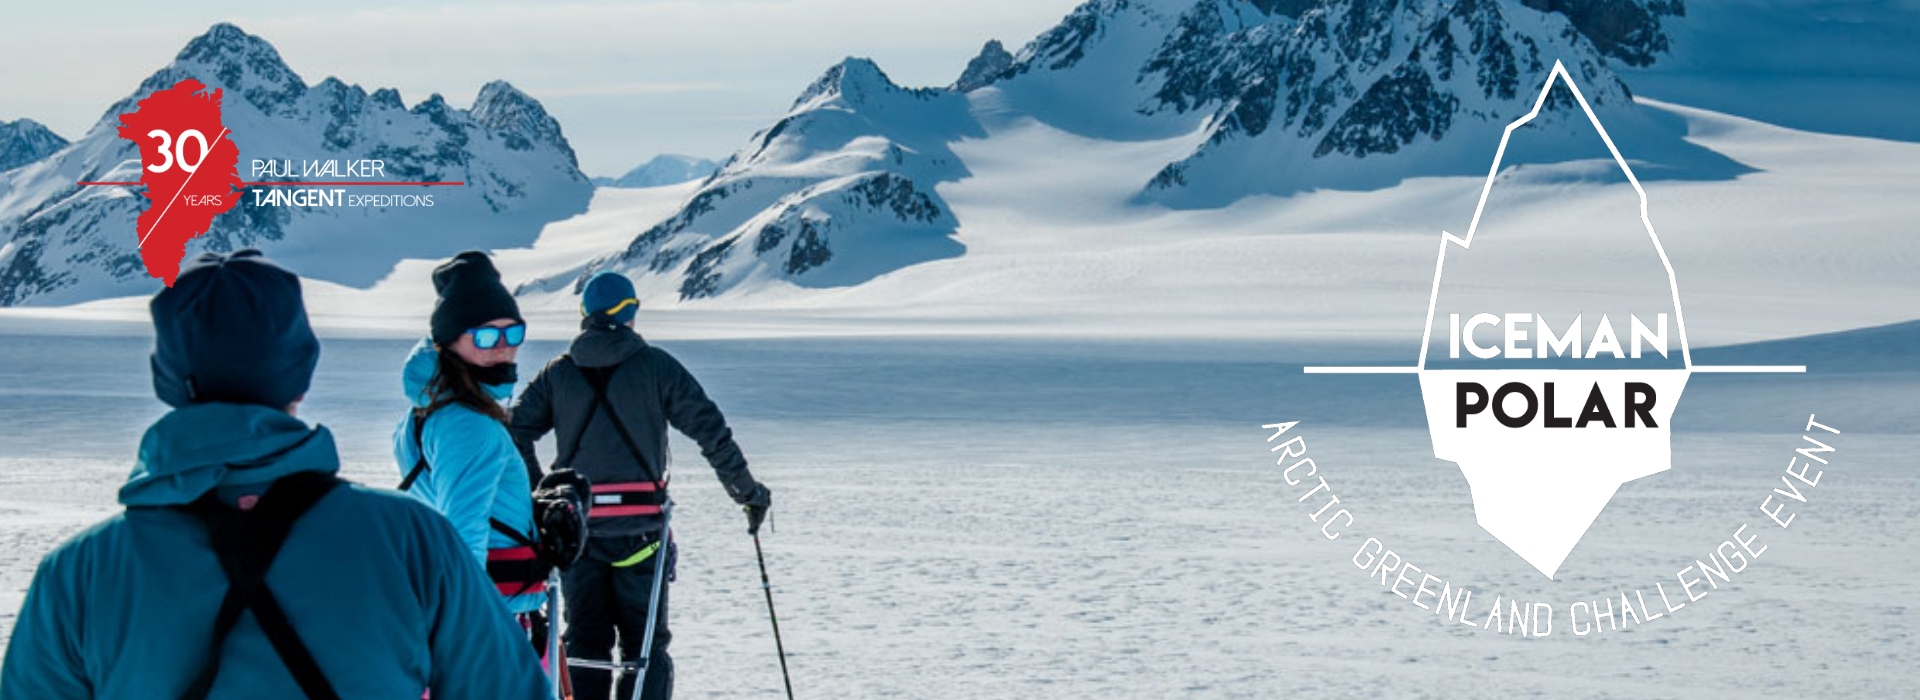 Iceman Polar Challenge